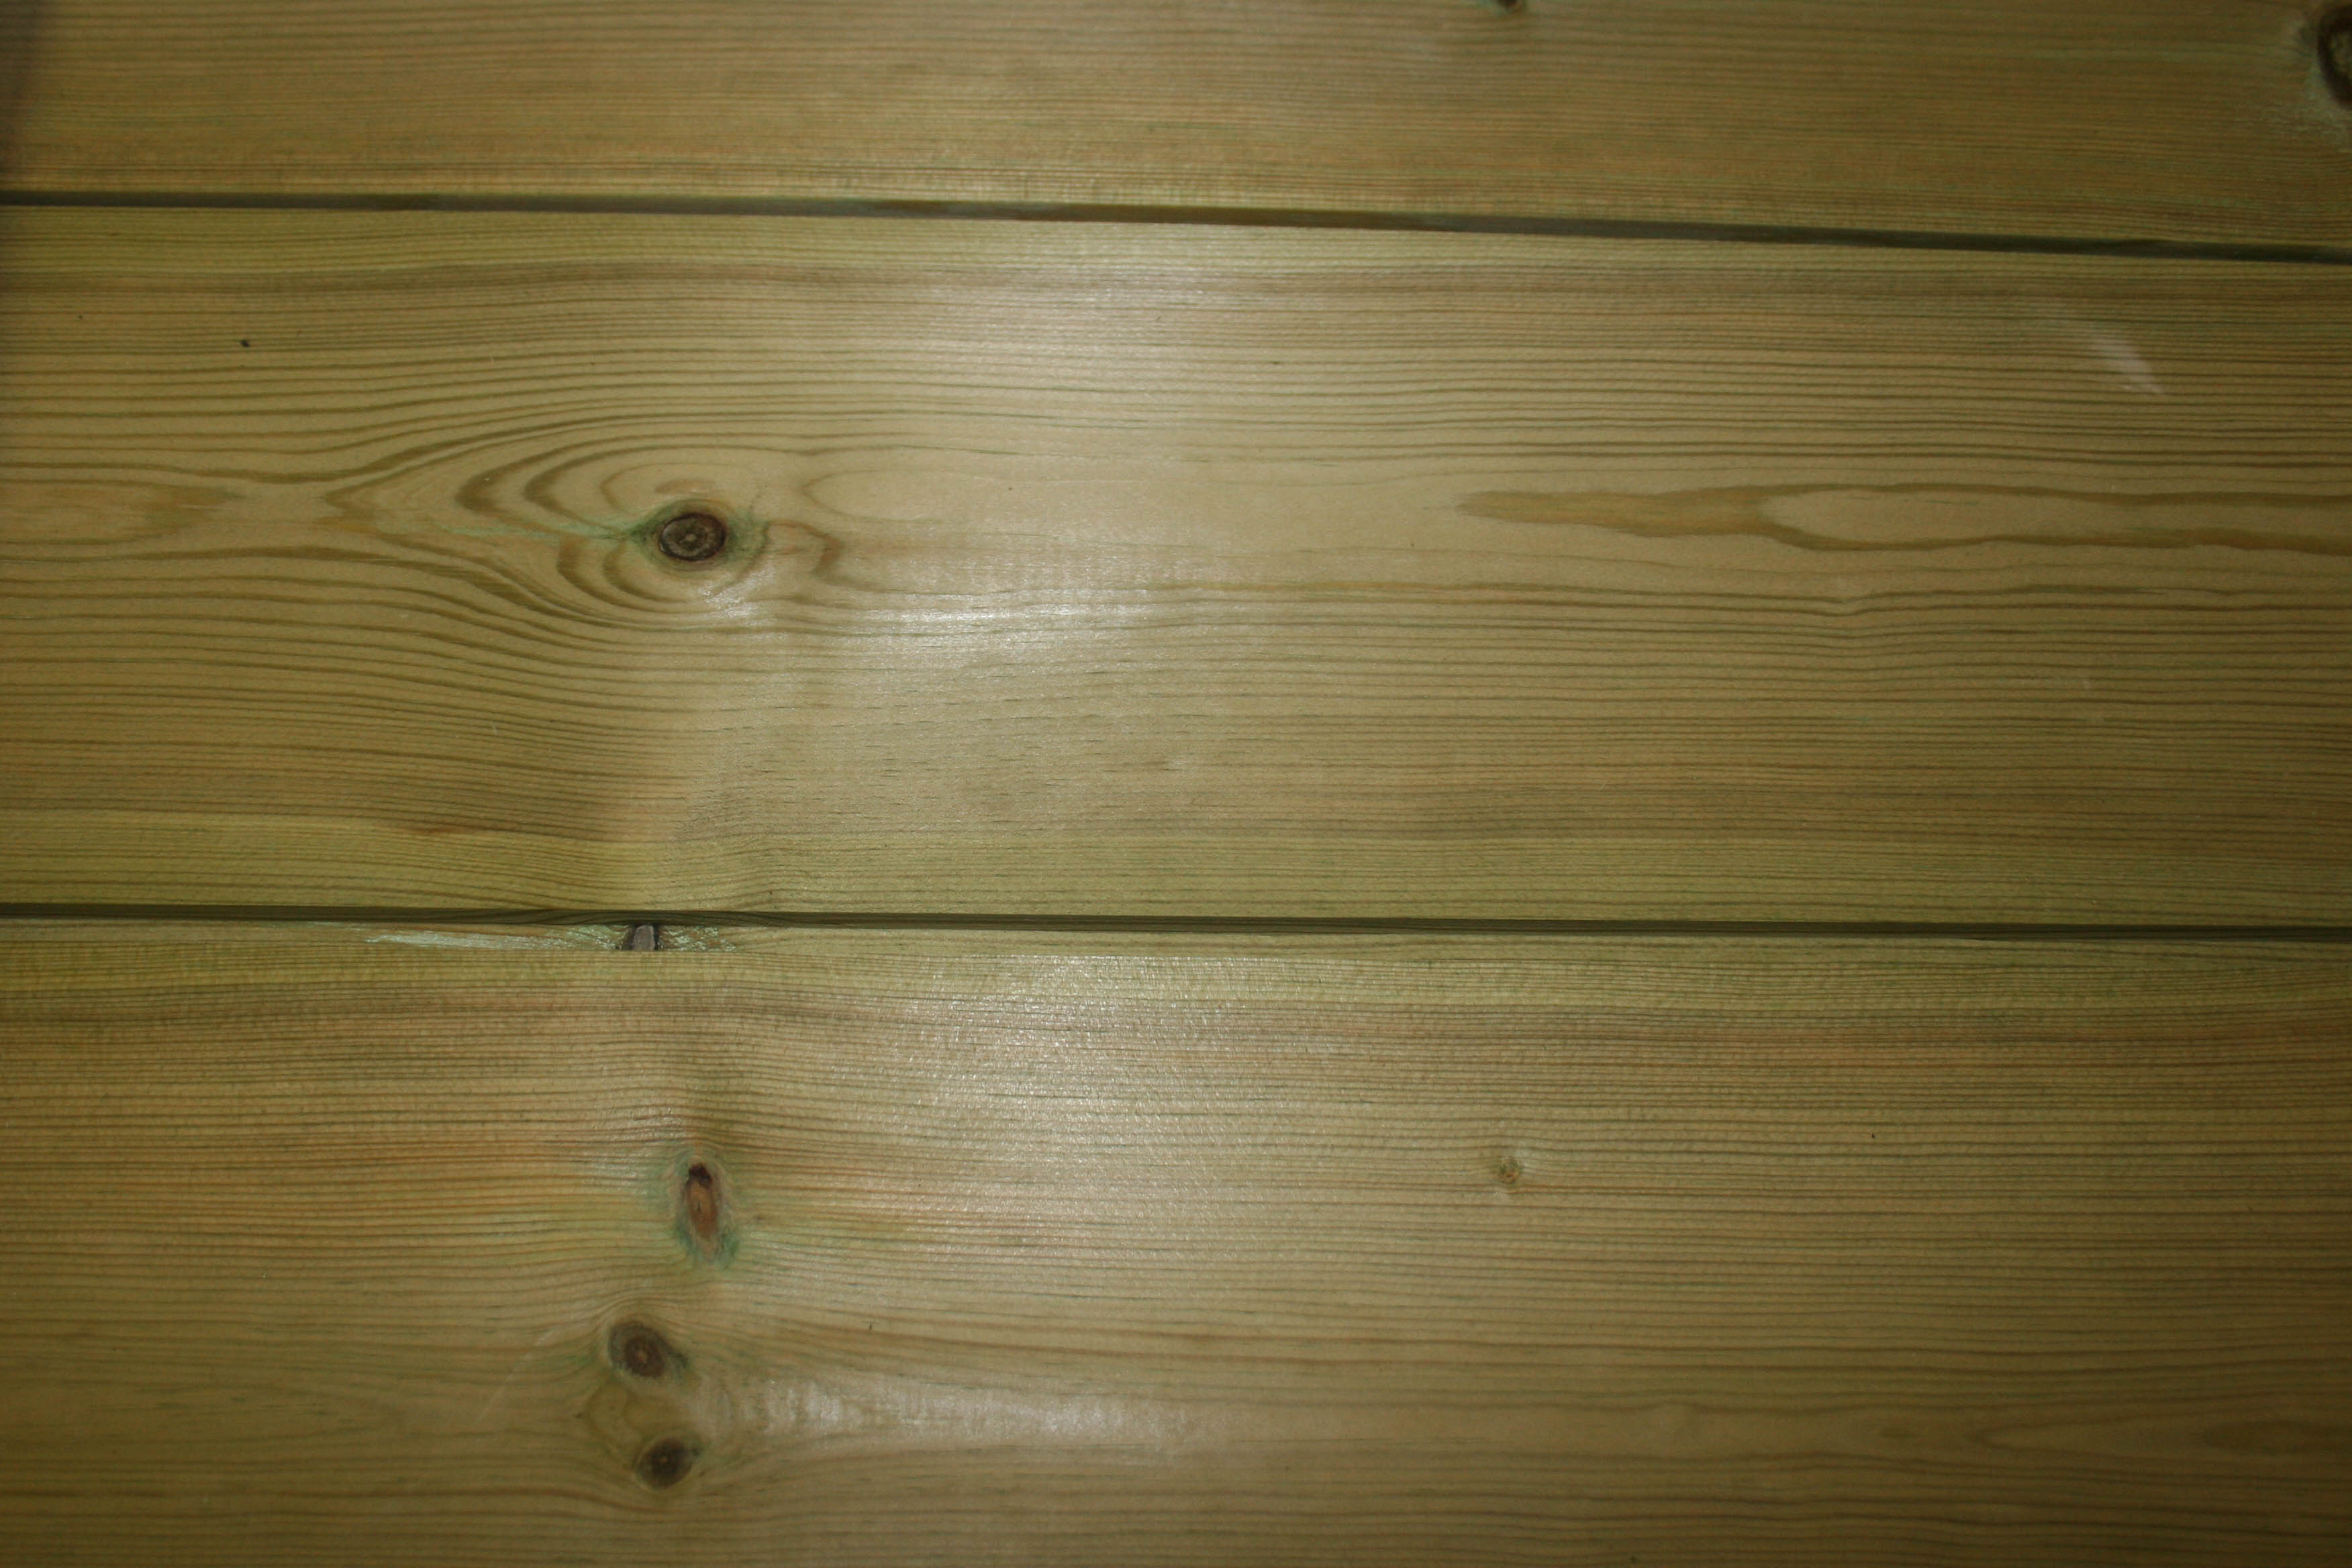 Fabrication sur mesure cerisier abris de jardin en bois - Fabricant abri de jardin en bois ...